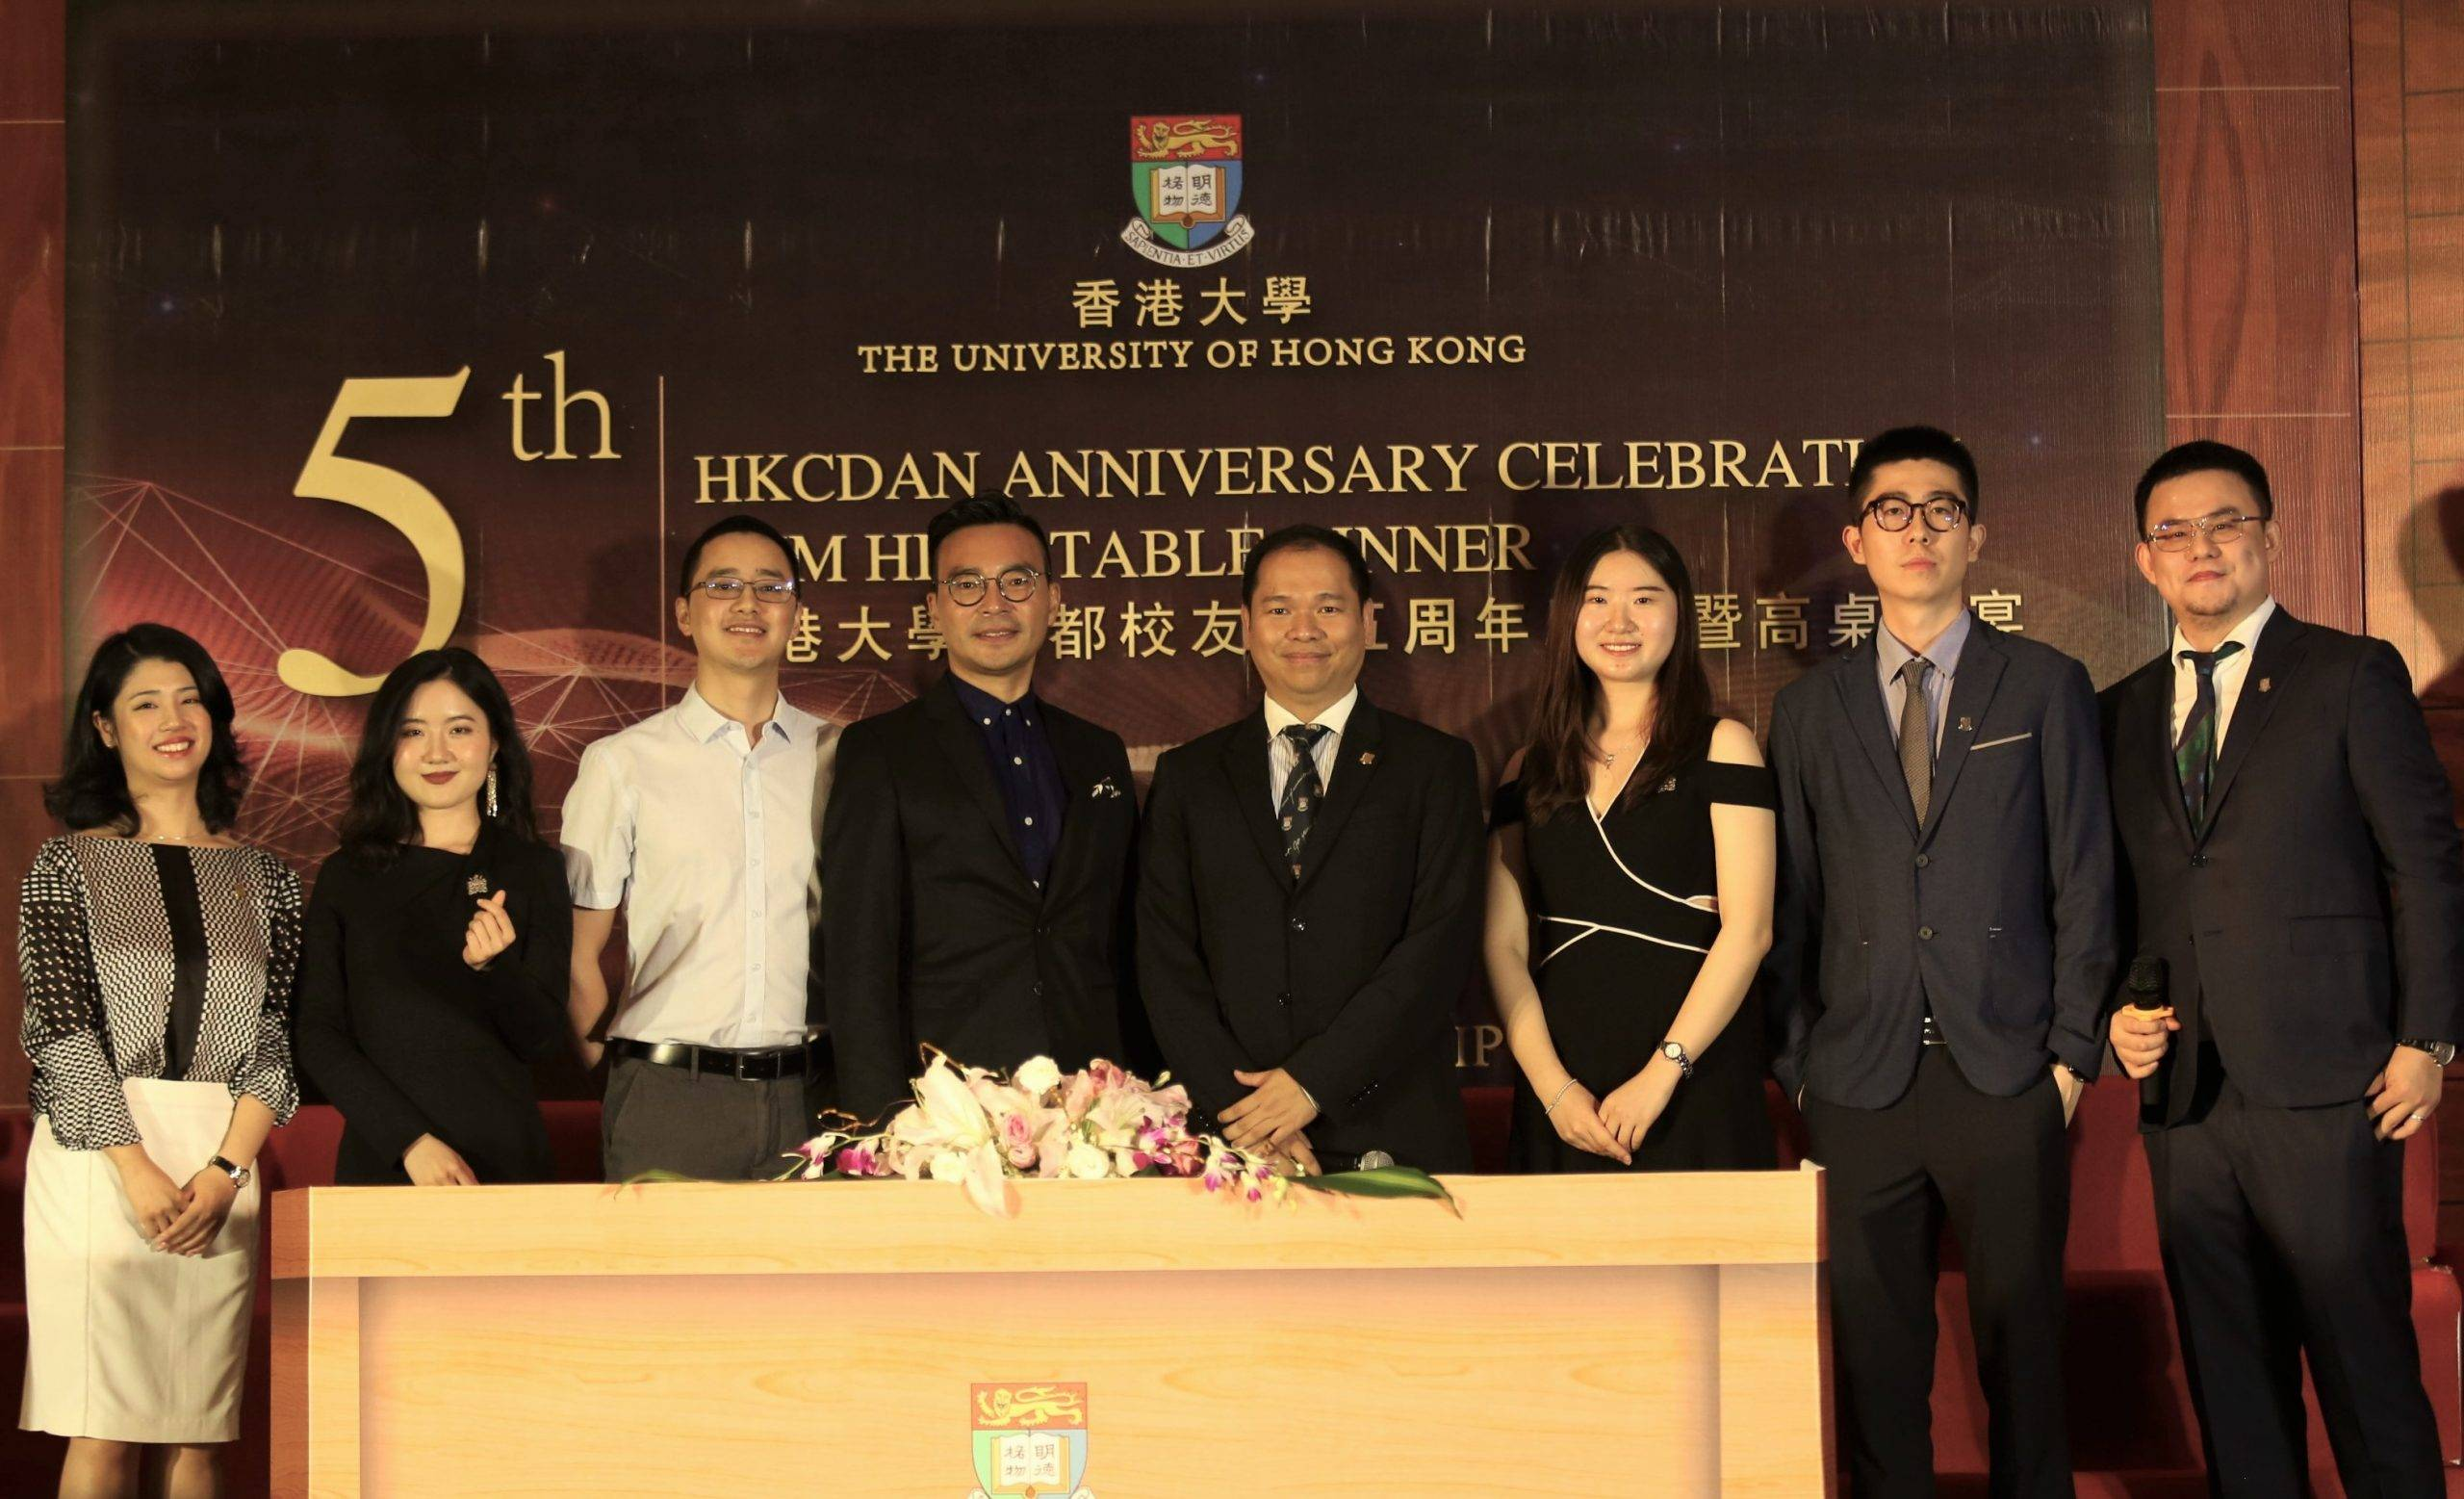 HKU Chengdu Alumni Network